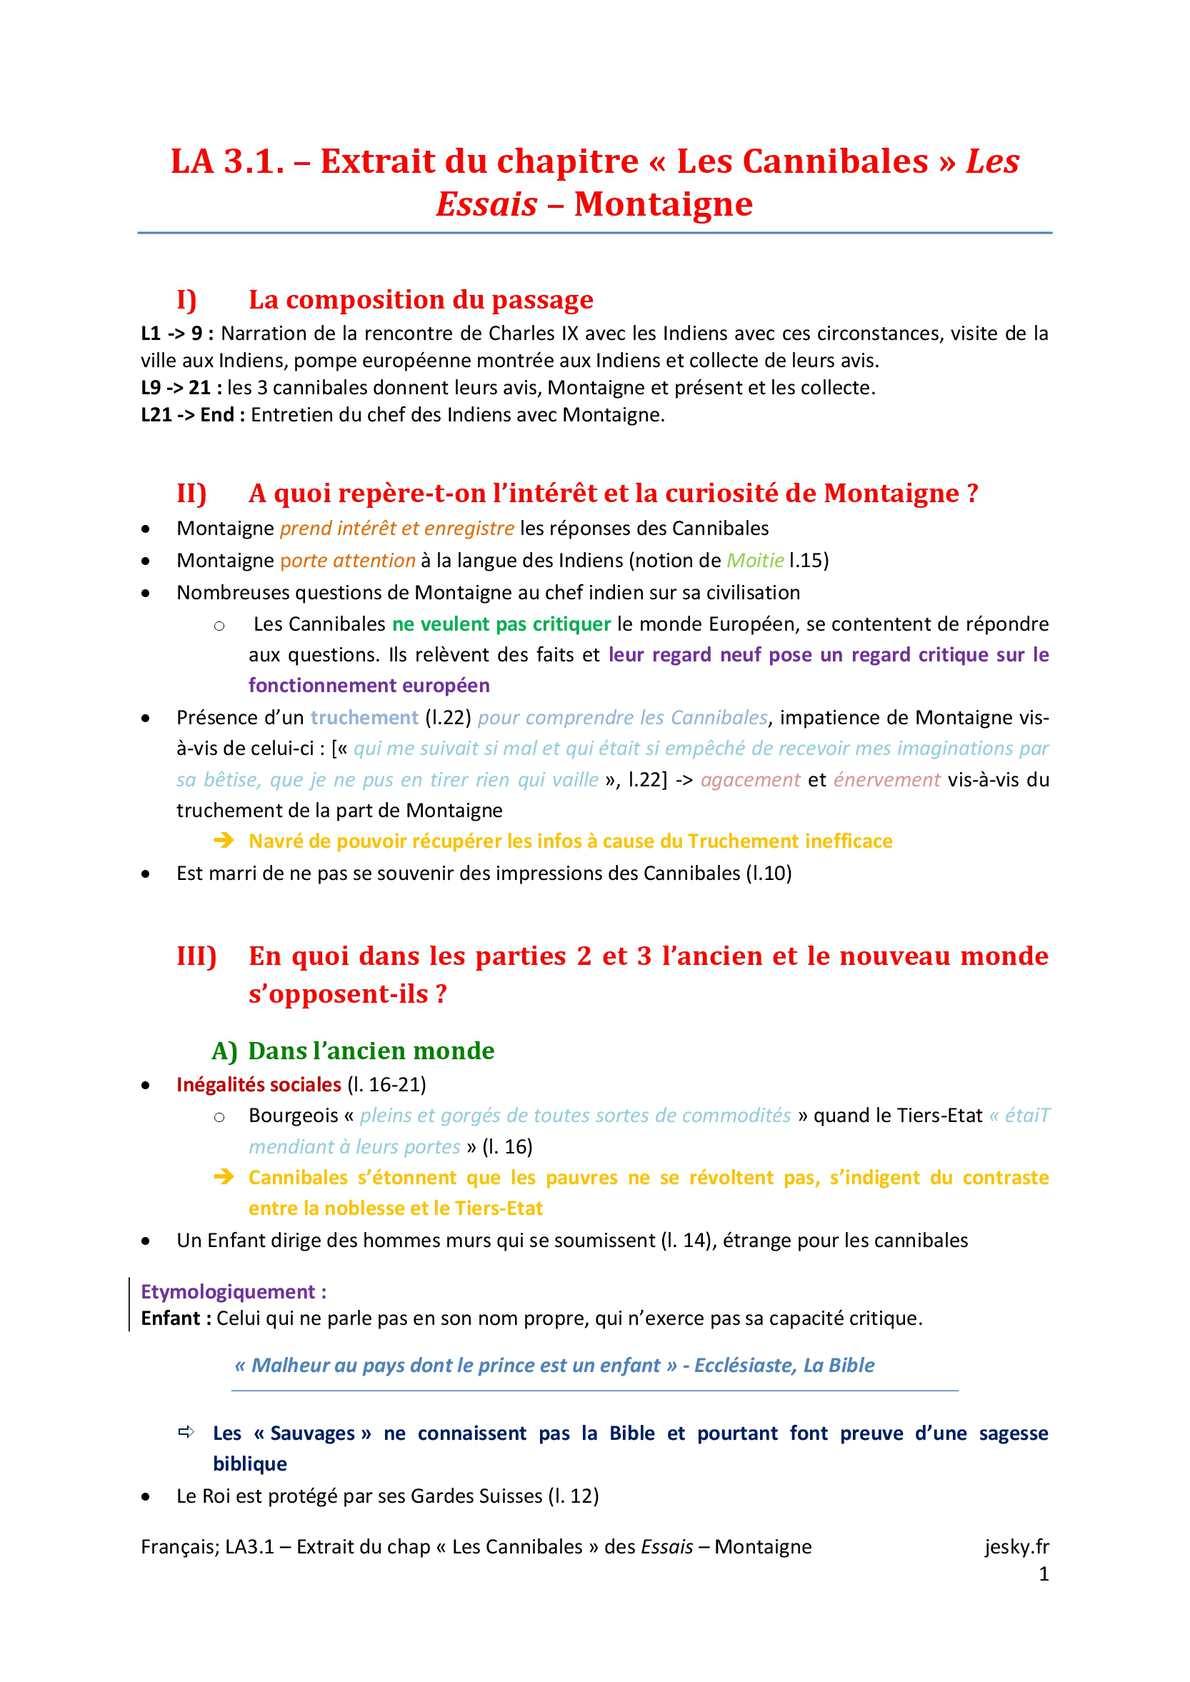 ES - FRANCAIS - LA 3.1 | JéSky.fr